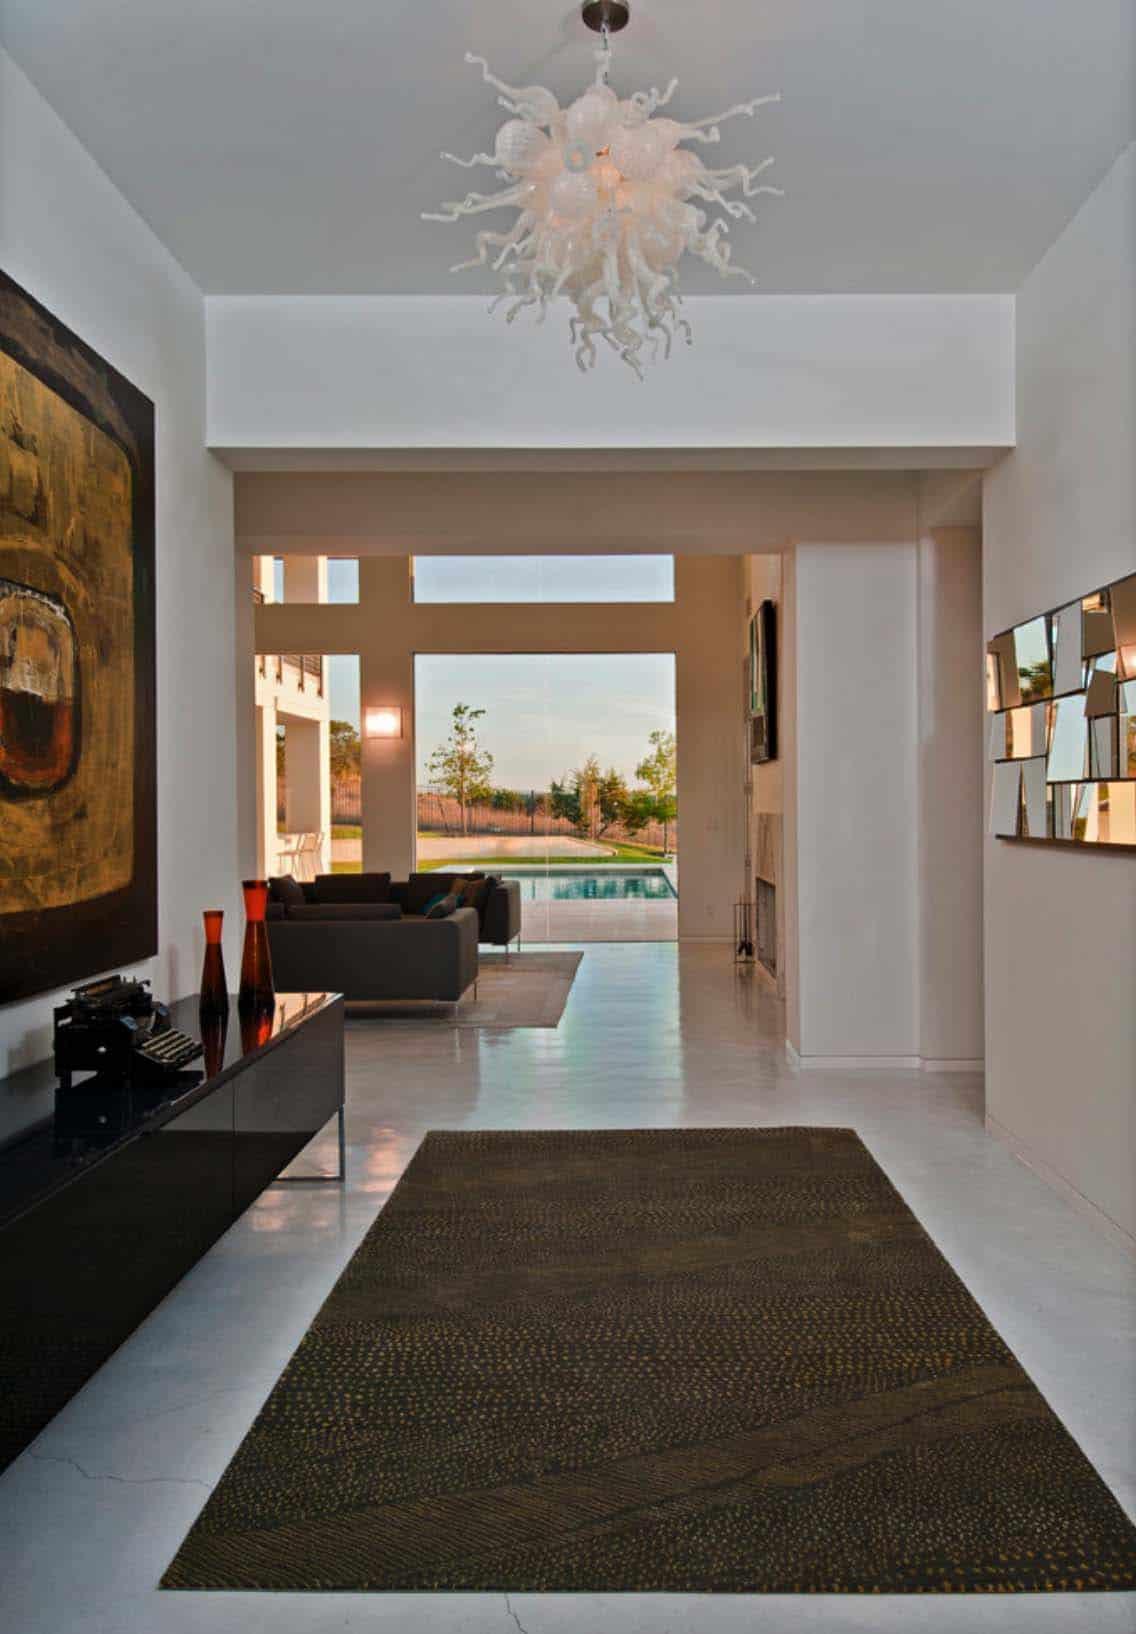 Coastal Contemporary Home-Cornerstone Architects-13-1 Kindesign